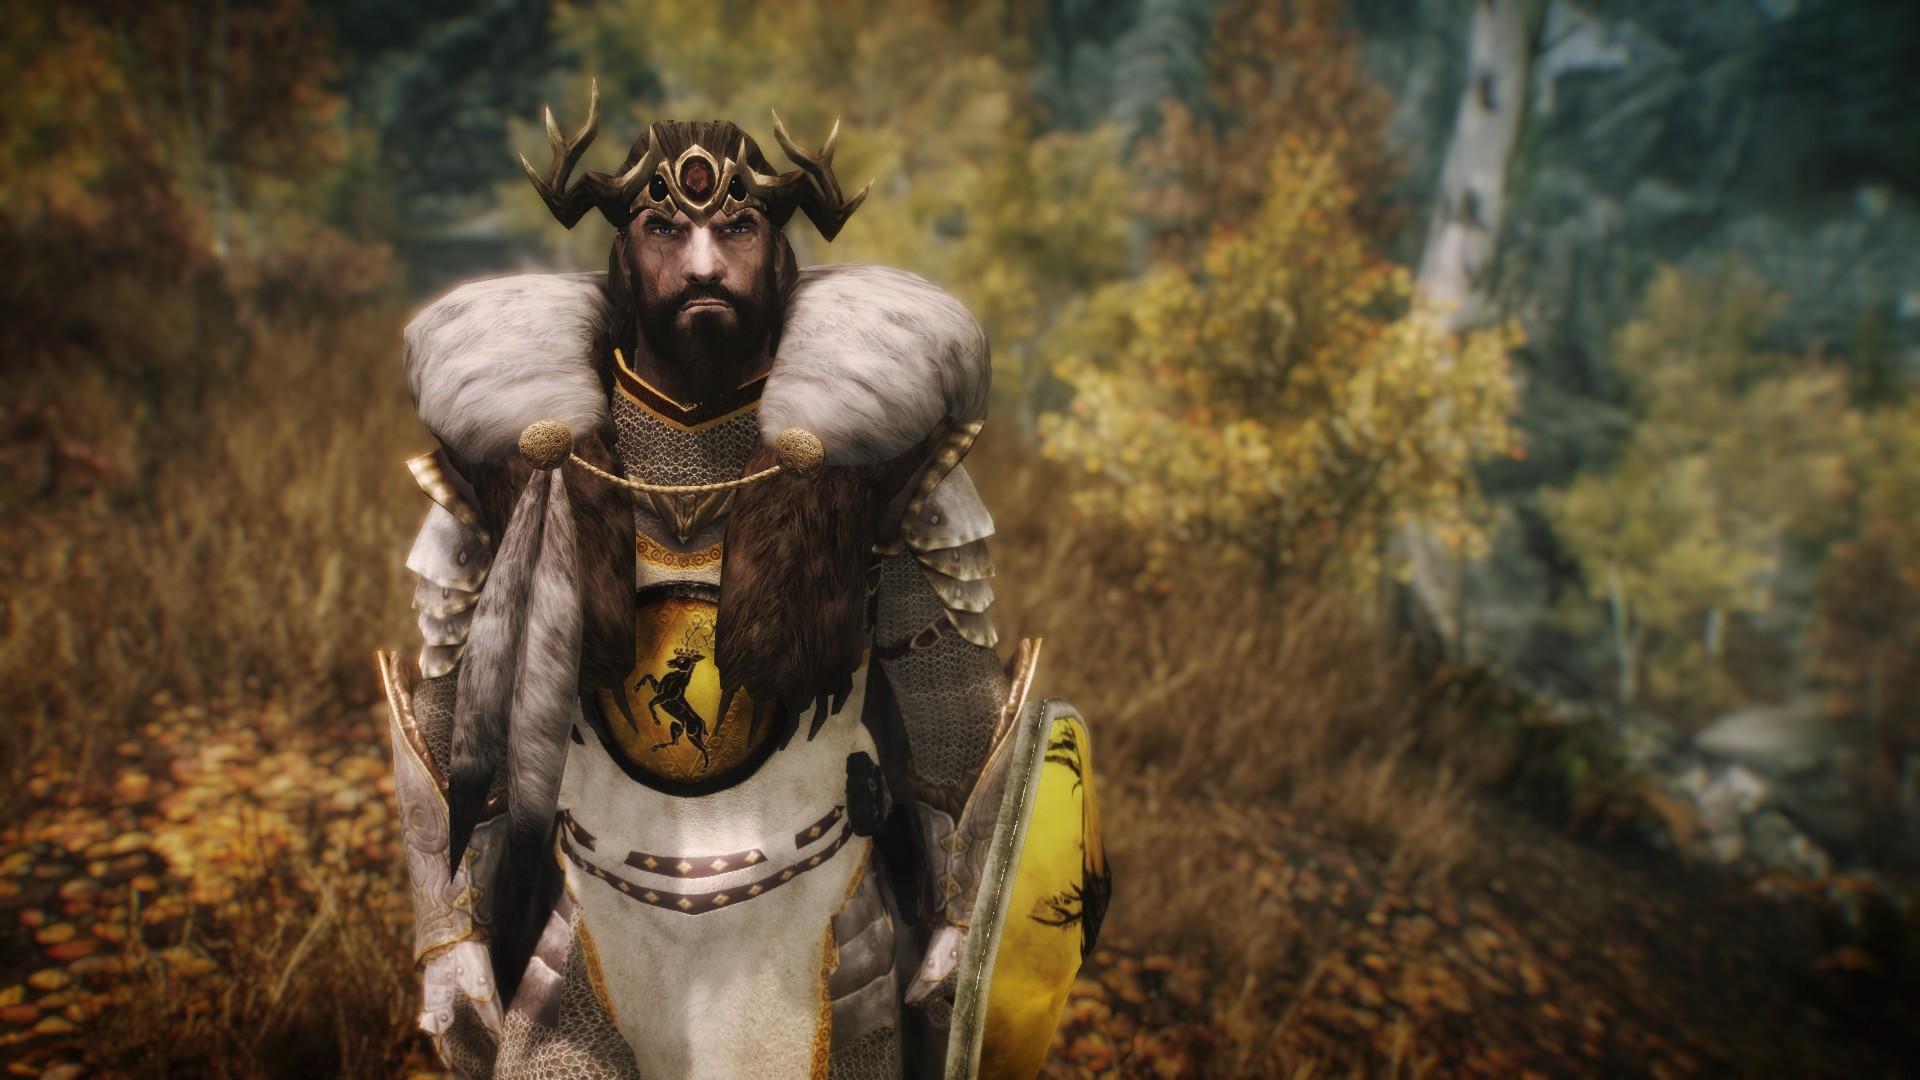 Armor, Attire and Jewelry (Skyrim) | The Elder Scrolls Mods